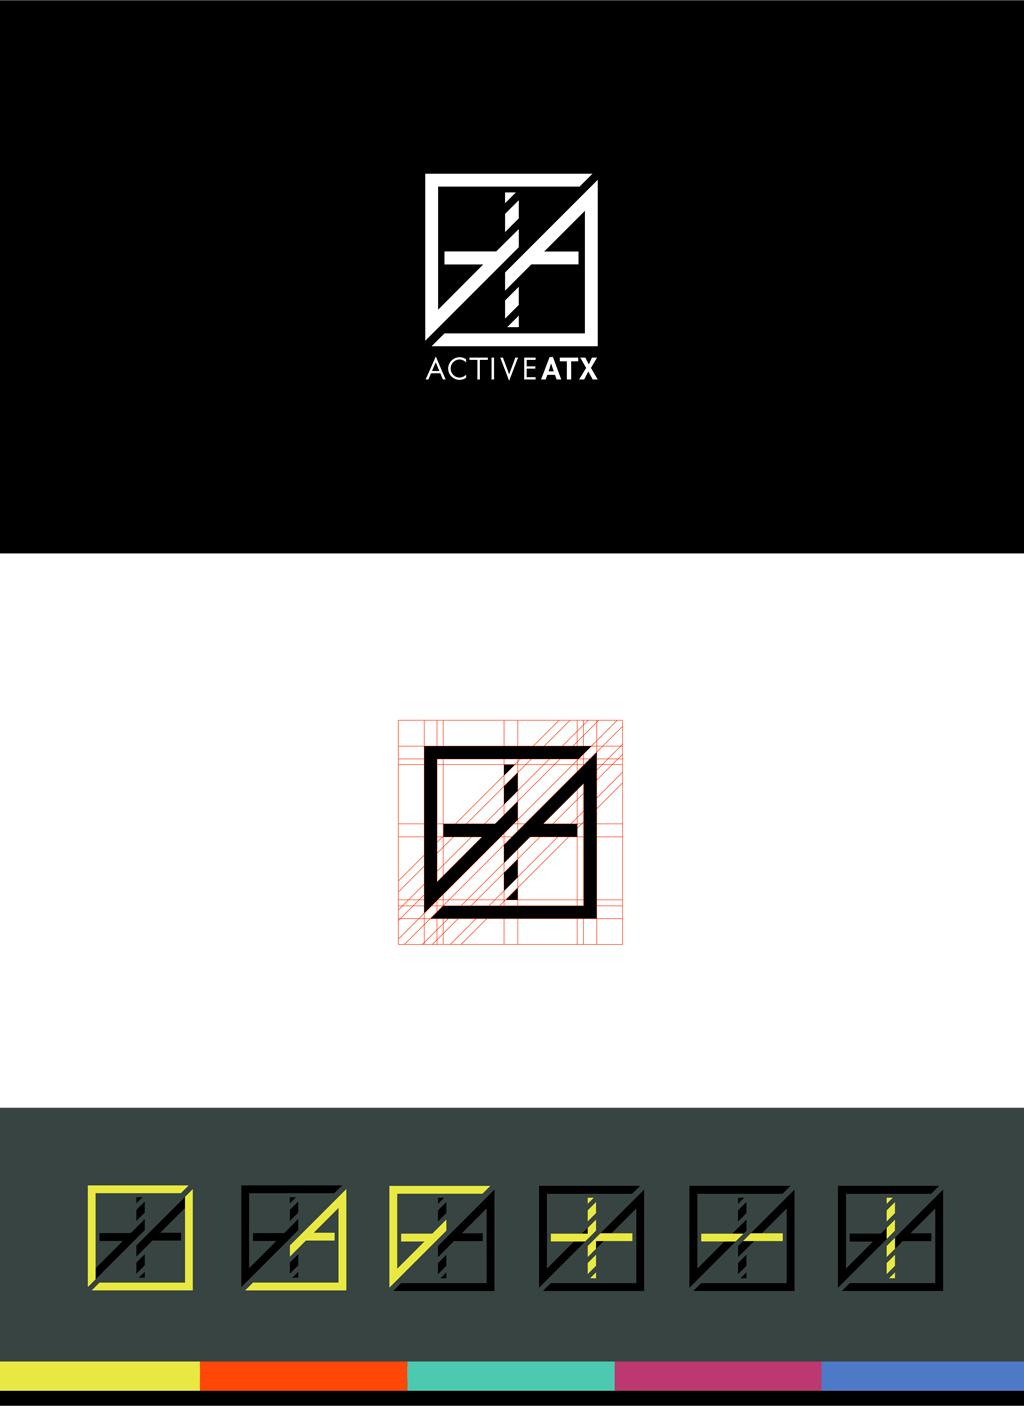 ActivtATX_logo_brand